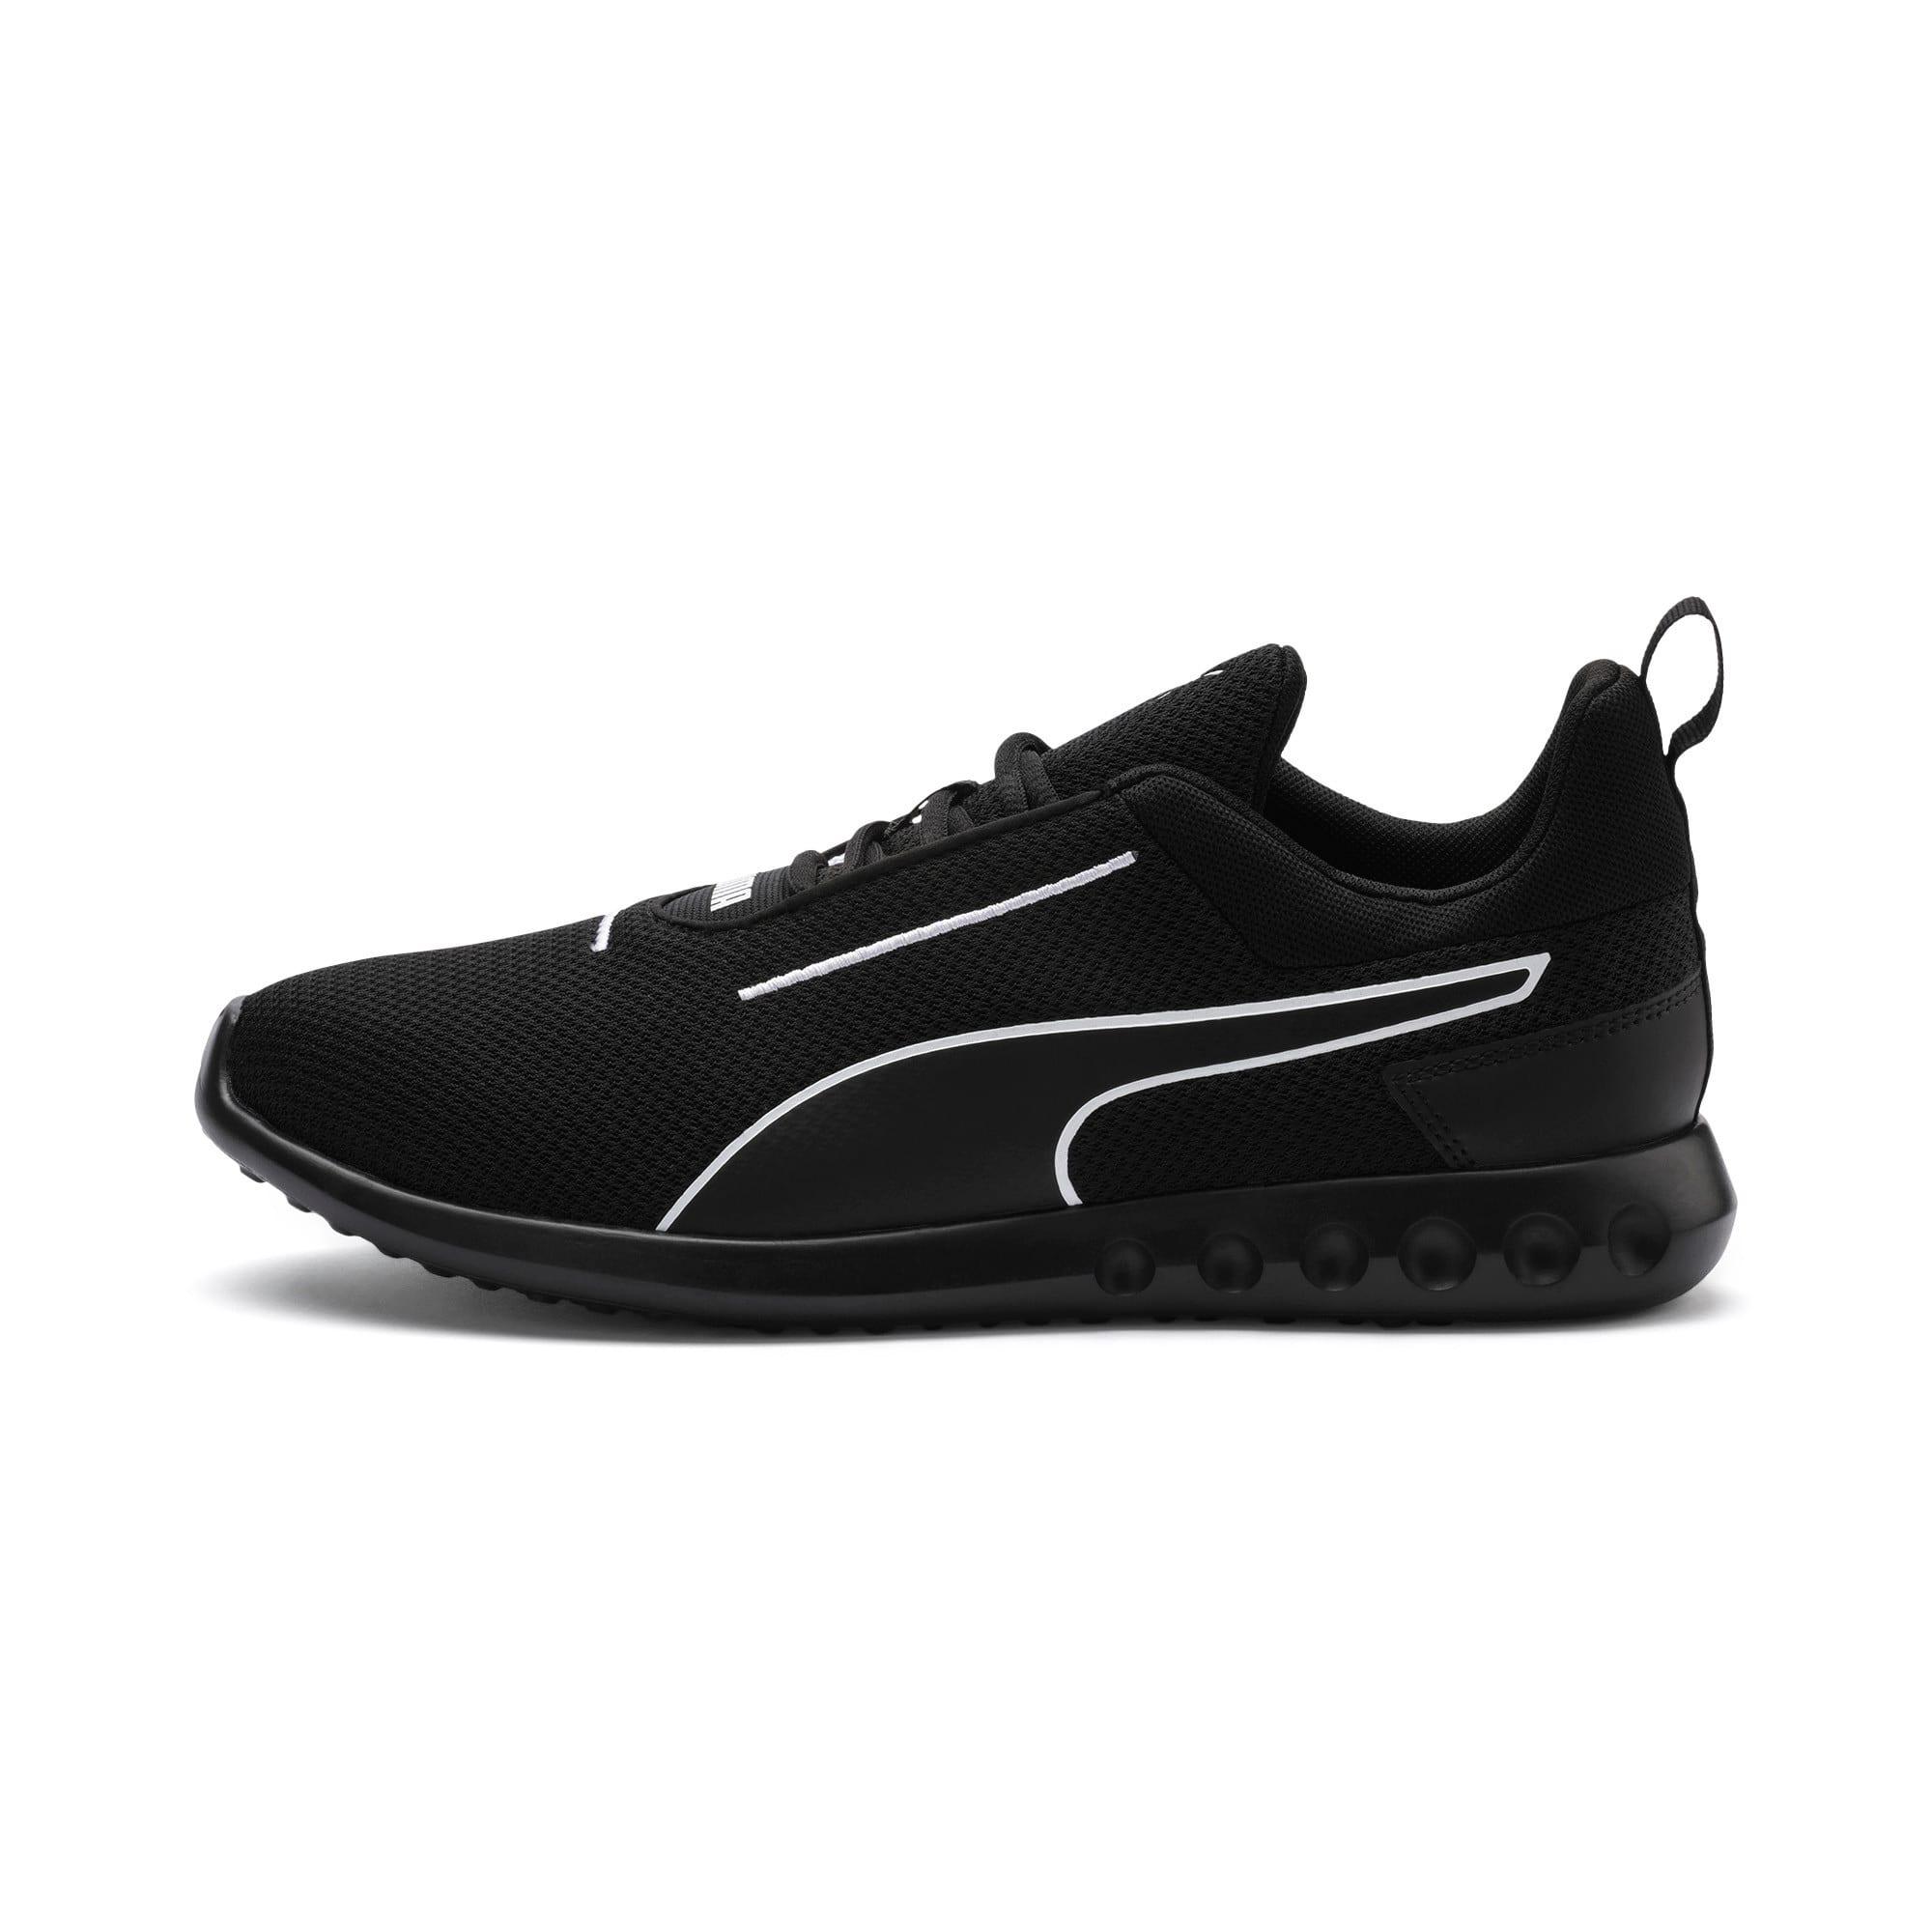 Thumbnail 1 of Carson 2 Concave Herren Sneaker, Puma Black-Puma White, medium